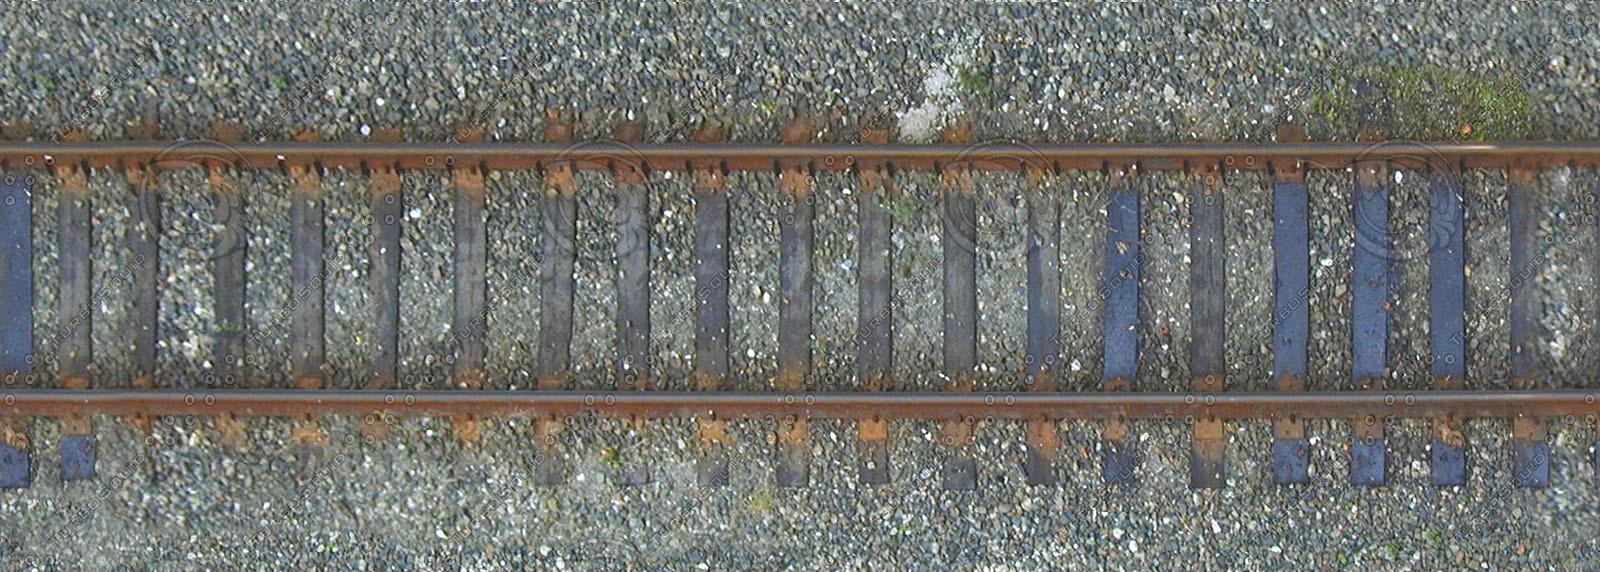 rail01L.jpg